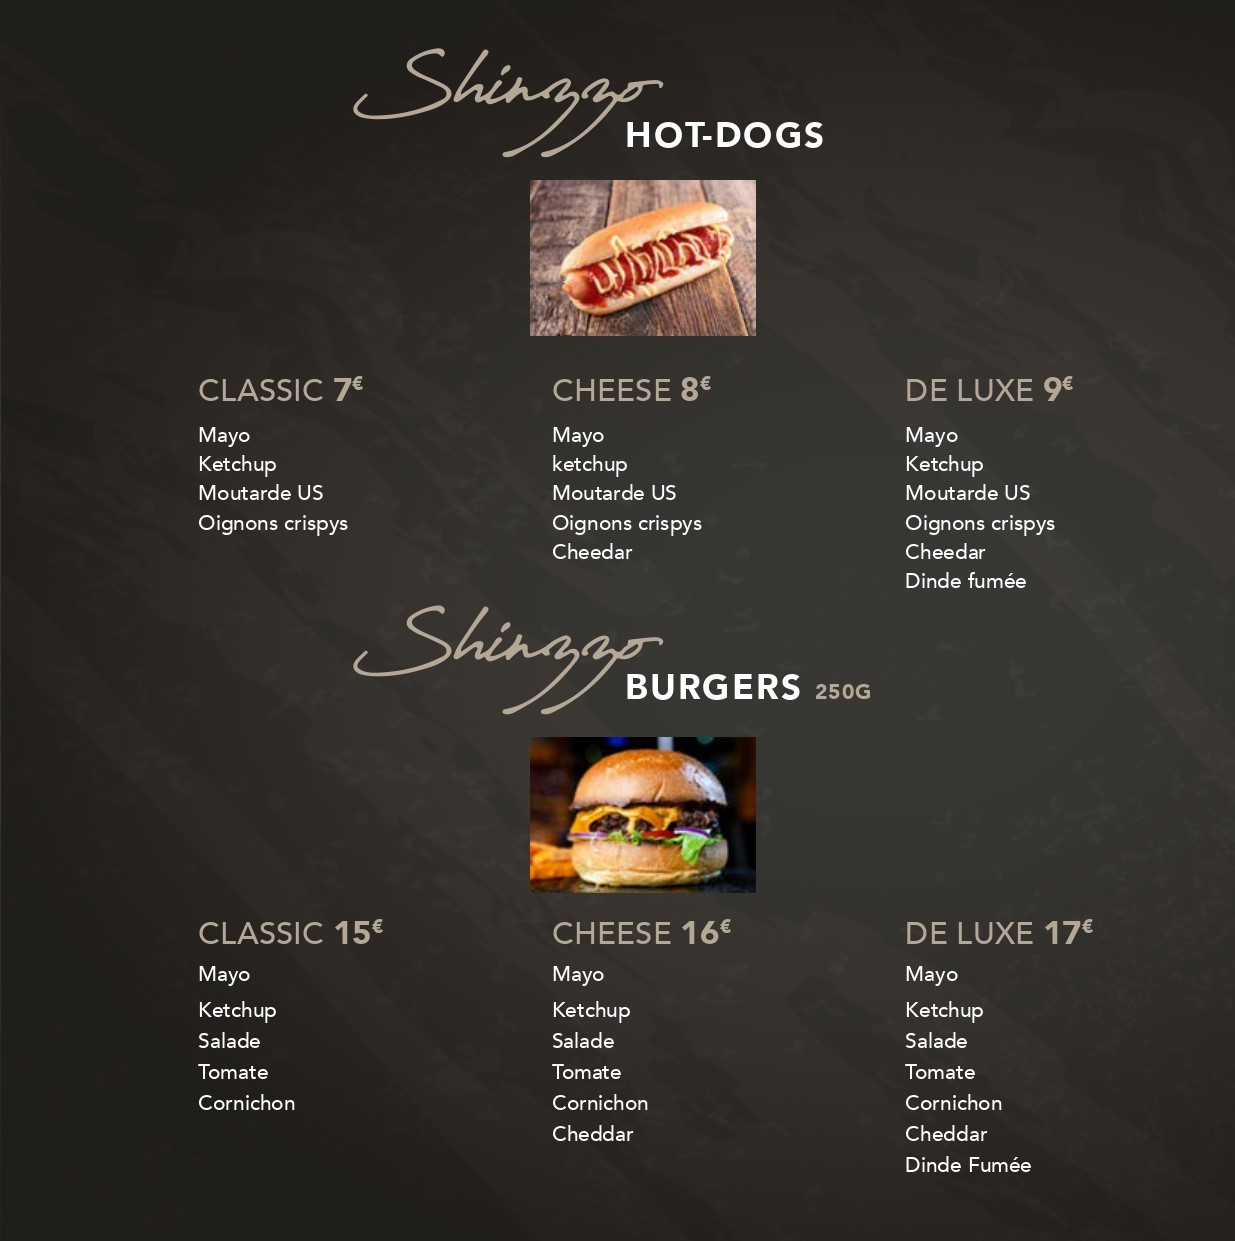 Hot Dogs & Burgers Shinzzo